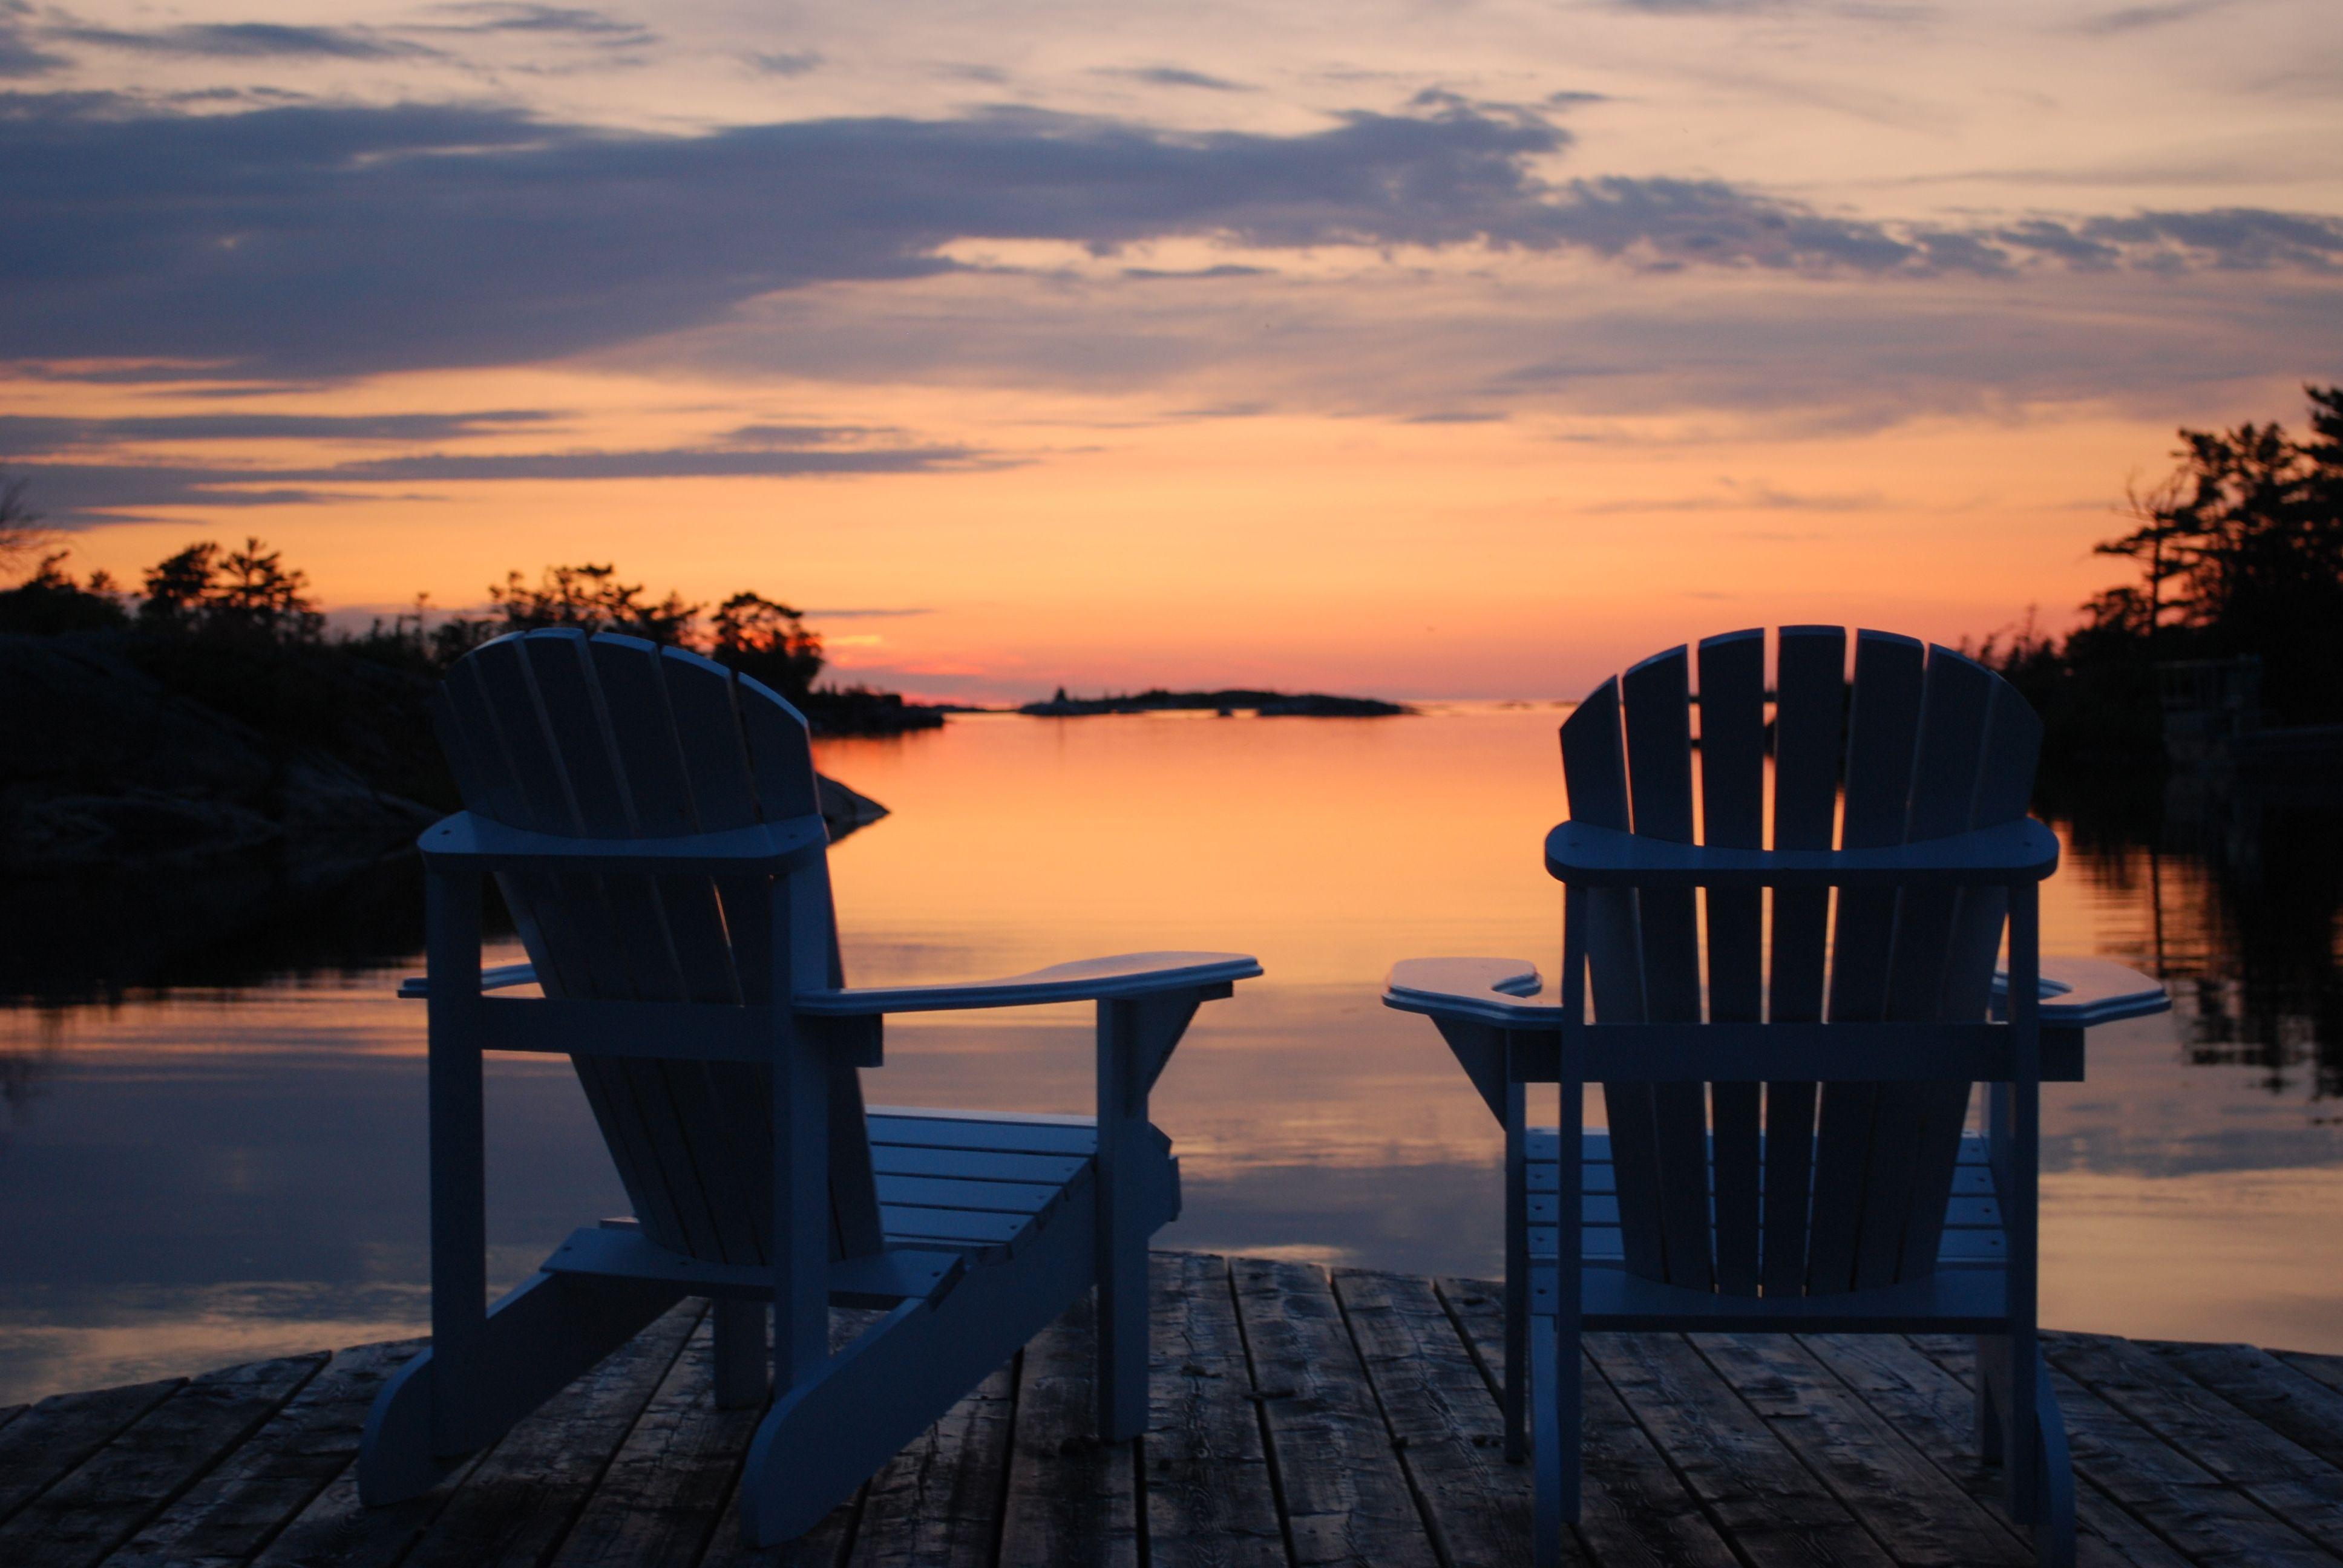 Georgian Bay Sunset With Muskoka Chairs Keeps Me Going